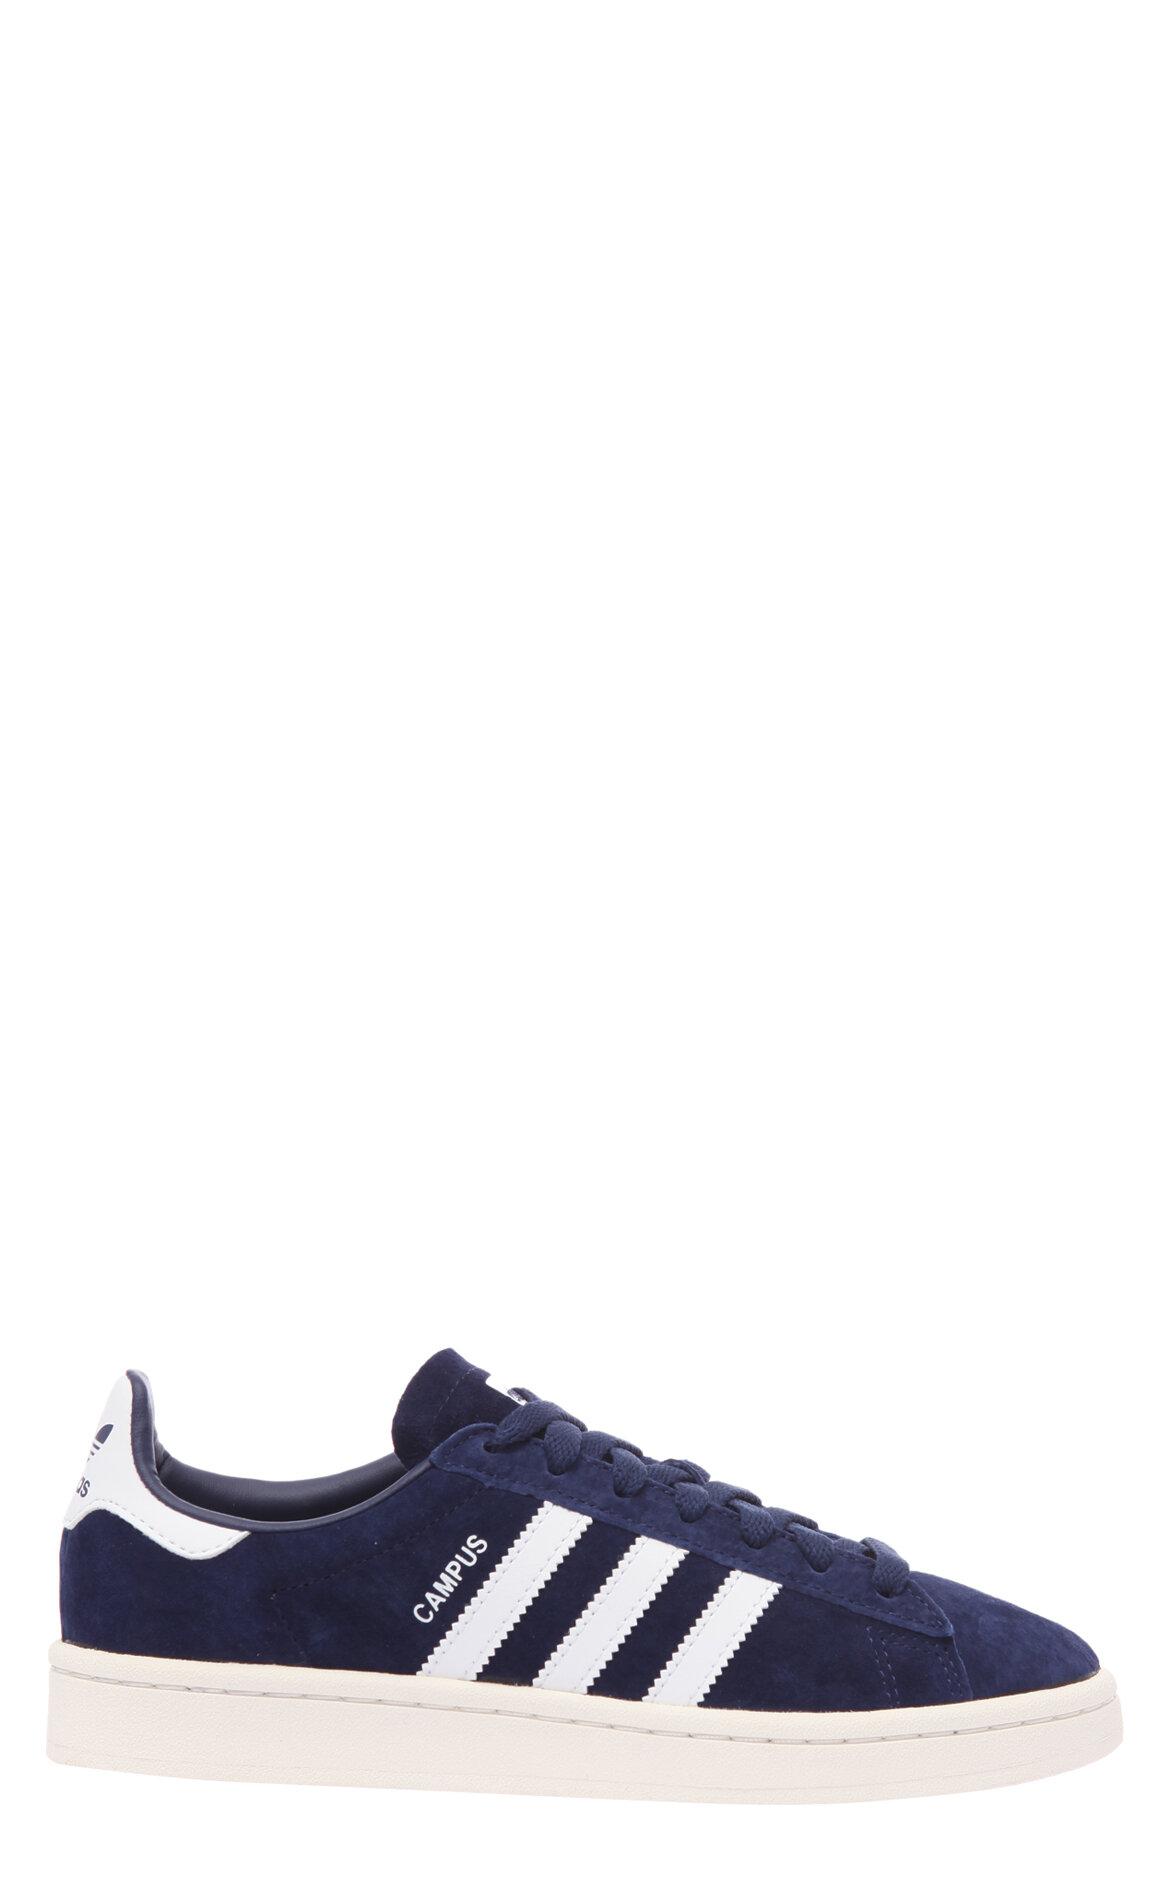 adidas originals Campus Spor Ayakkabı